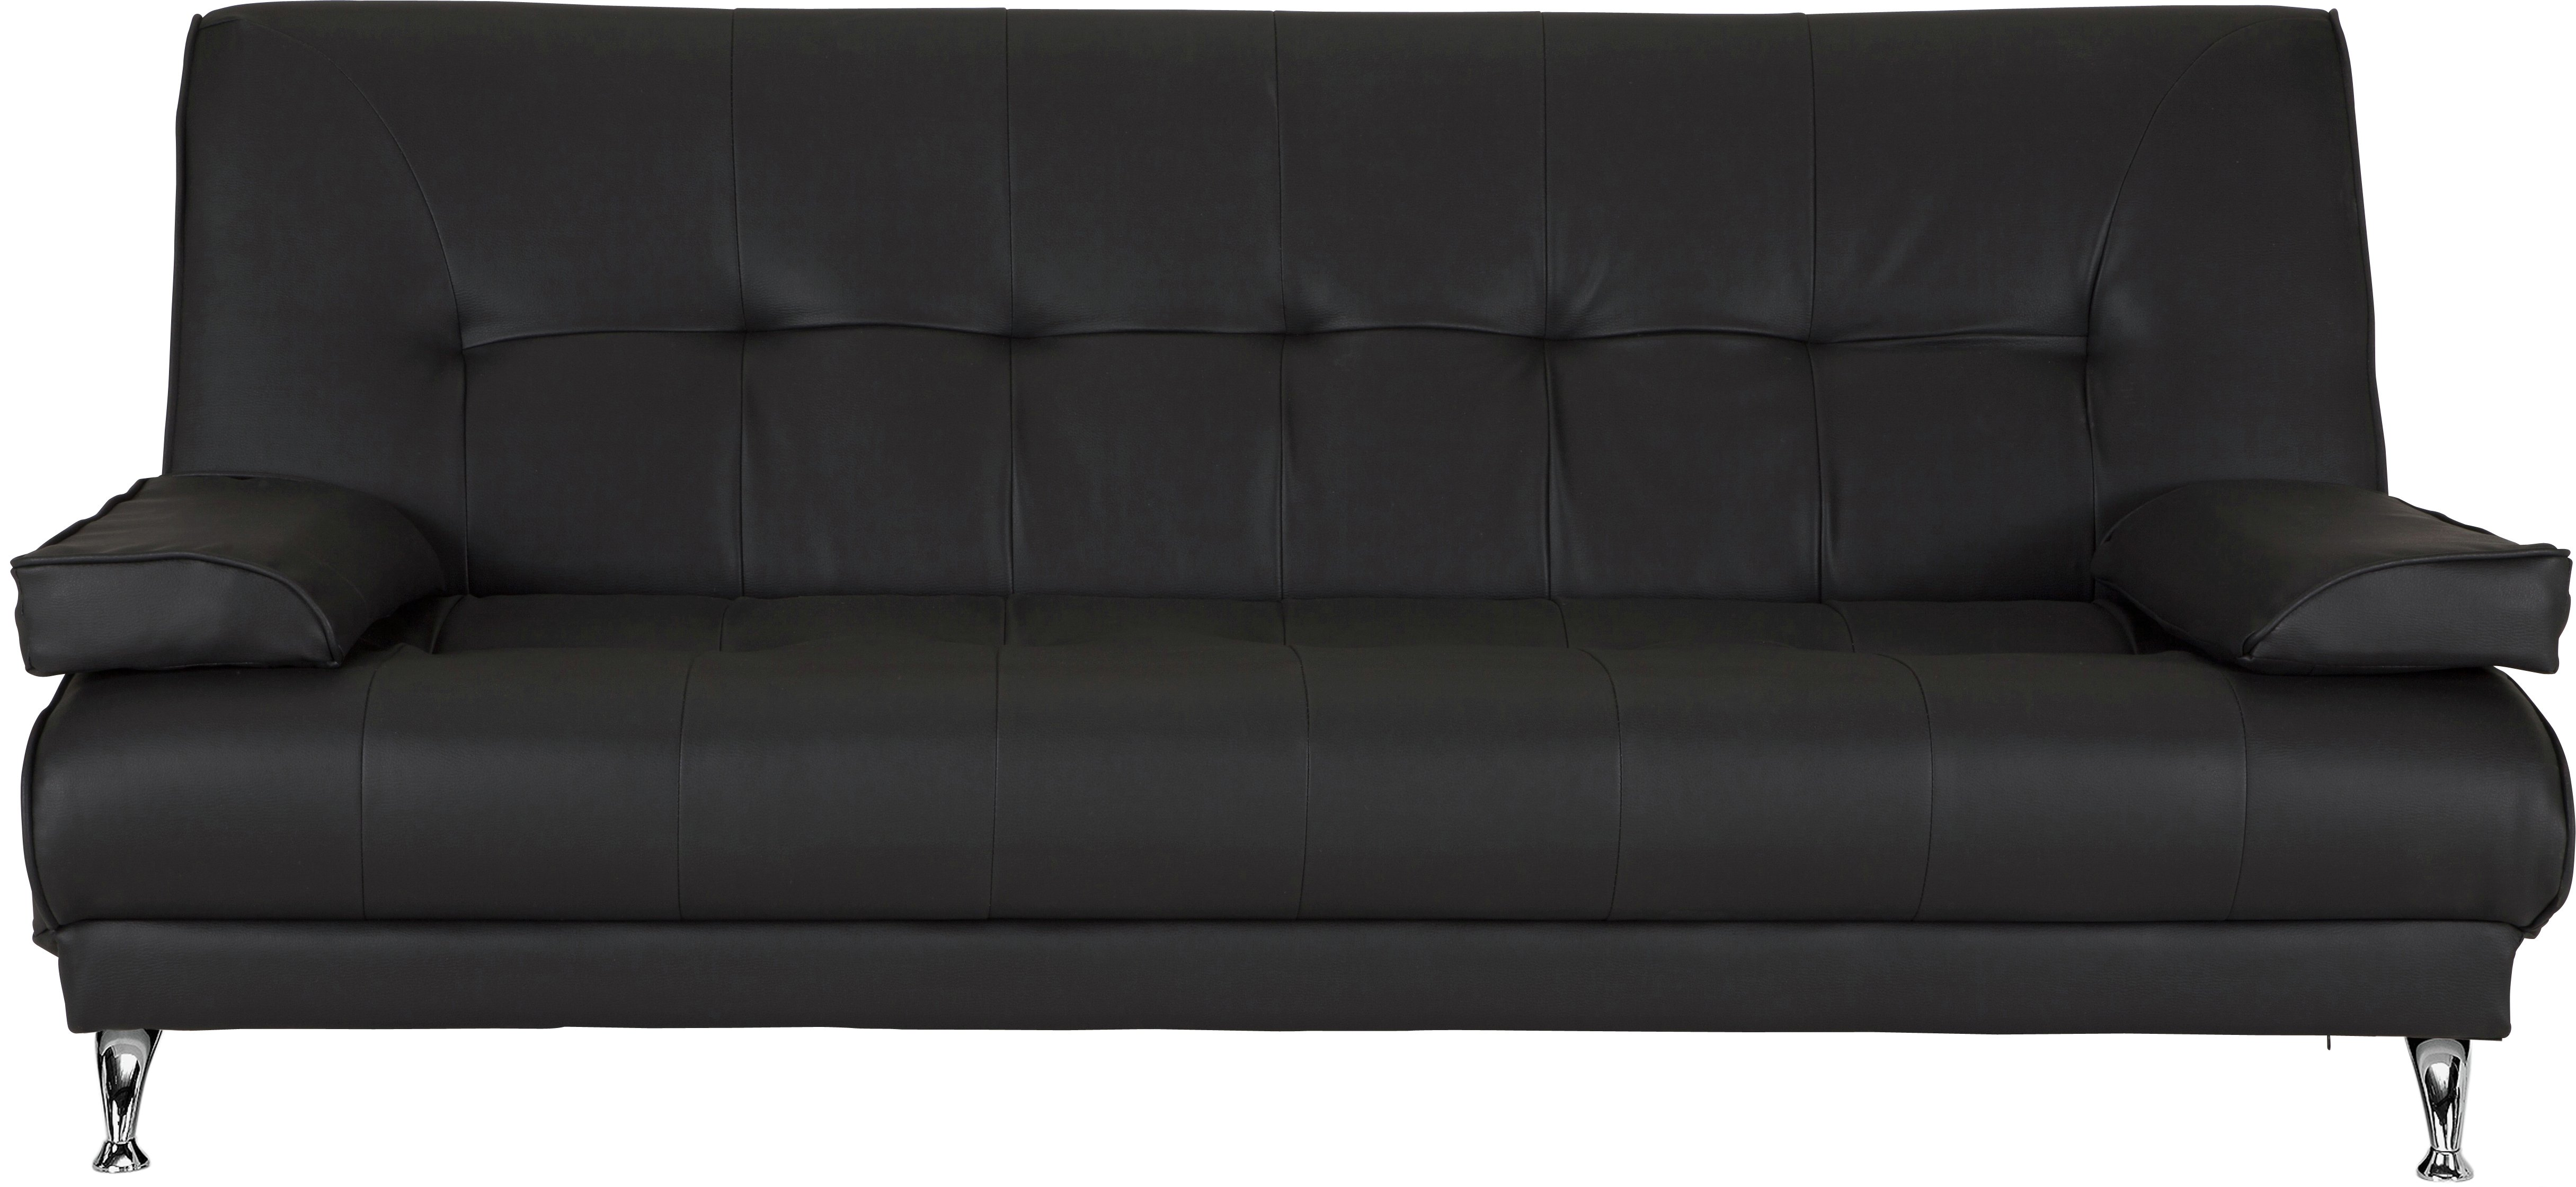 Buy Argos Home Sicily 2 Seater Fabric Clic Clac Sofa Bed - Black